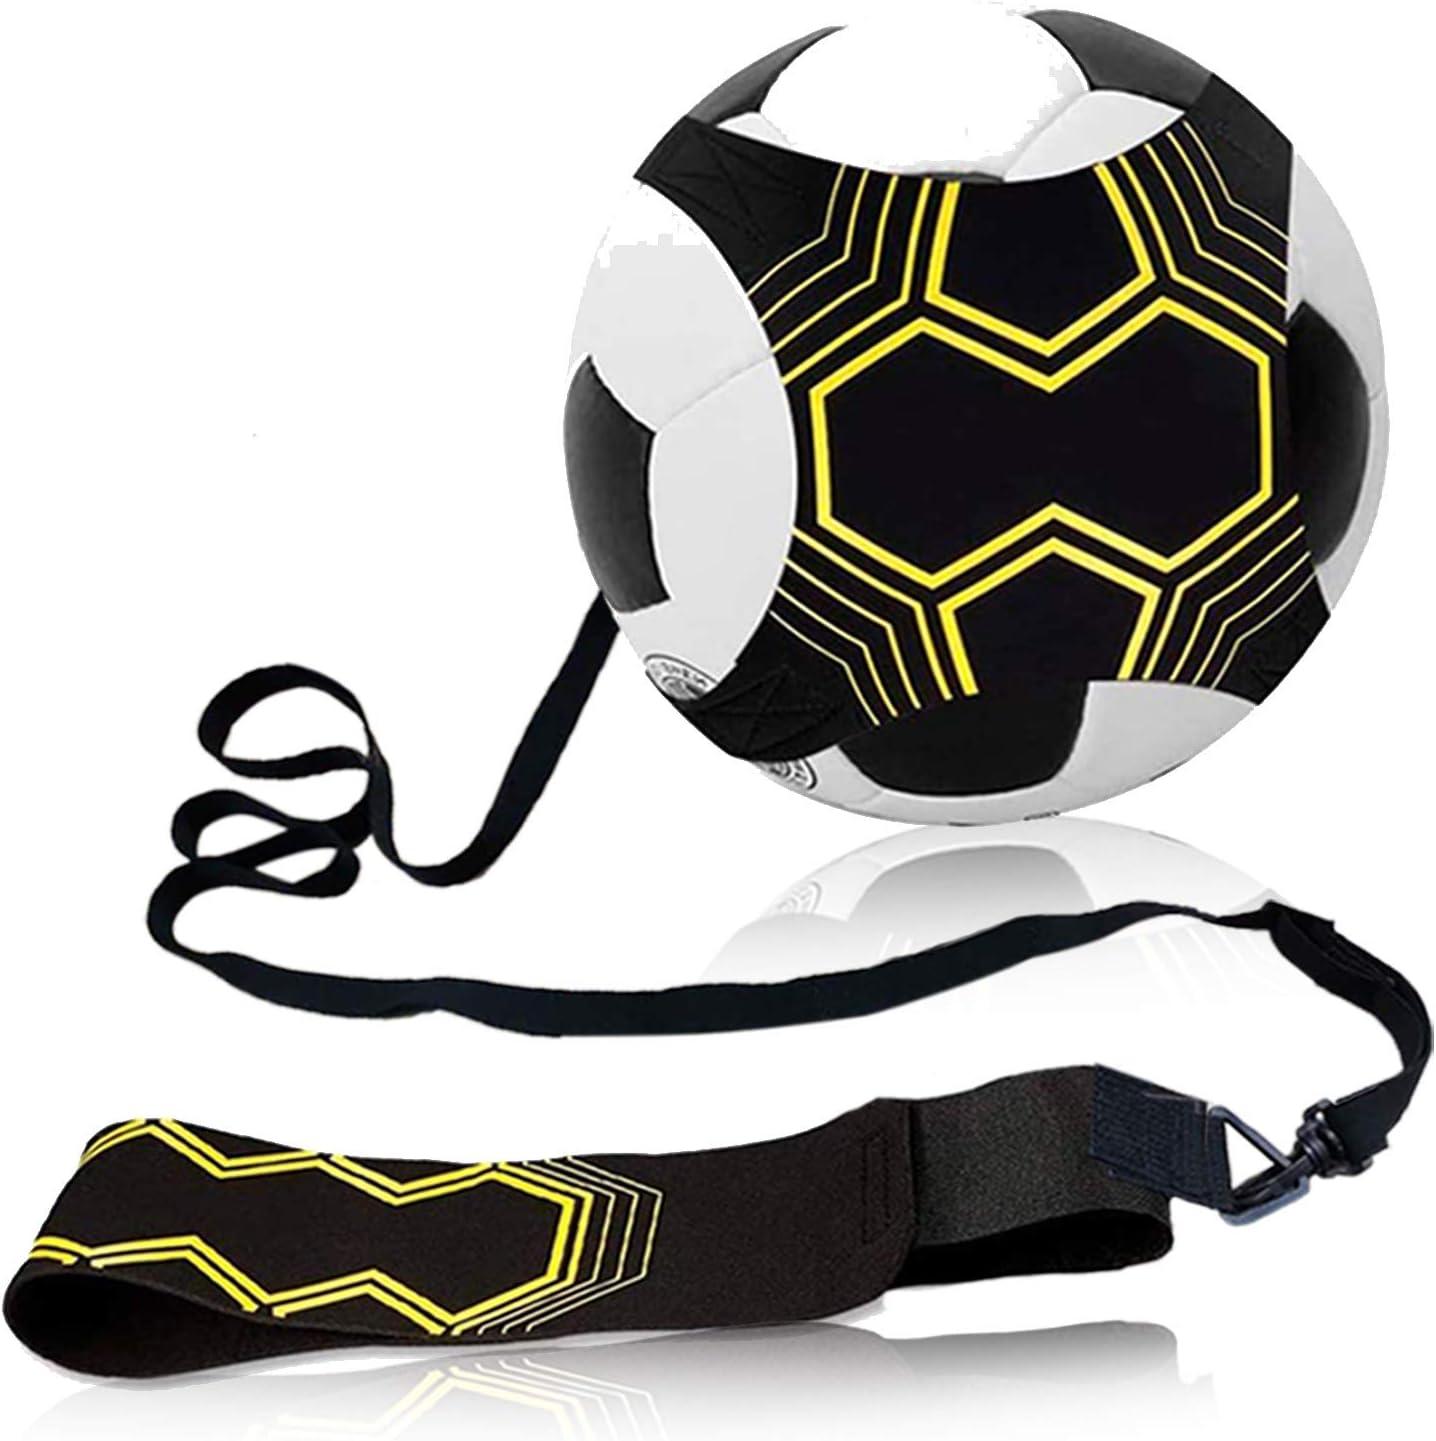 Kick Soccer Football Trainer Training Aid Practice Skills Adult Sport Equipment